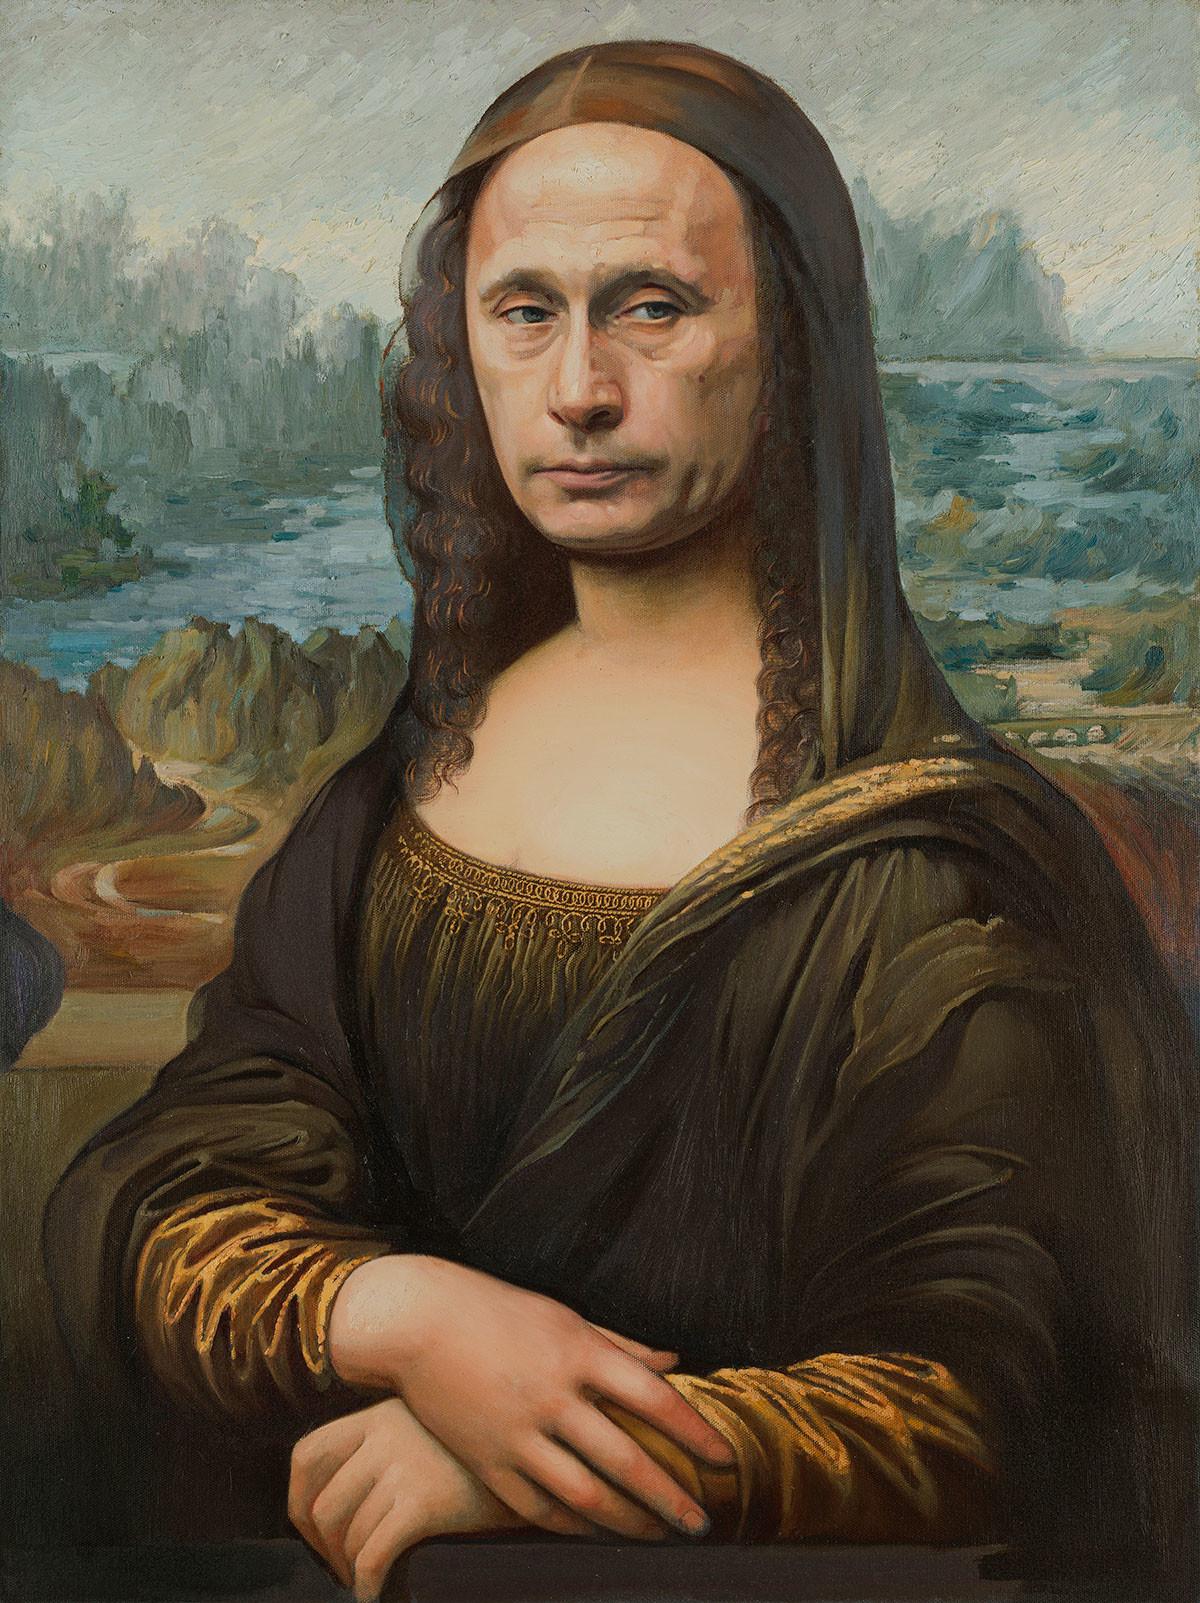 Alexánder Kosolapov. Mona Lisa, 2020